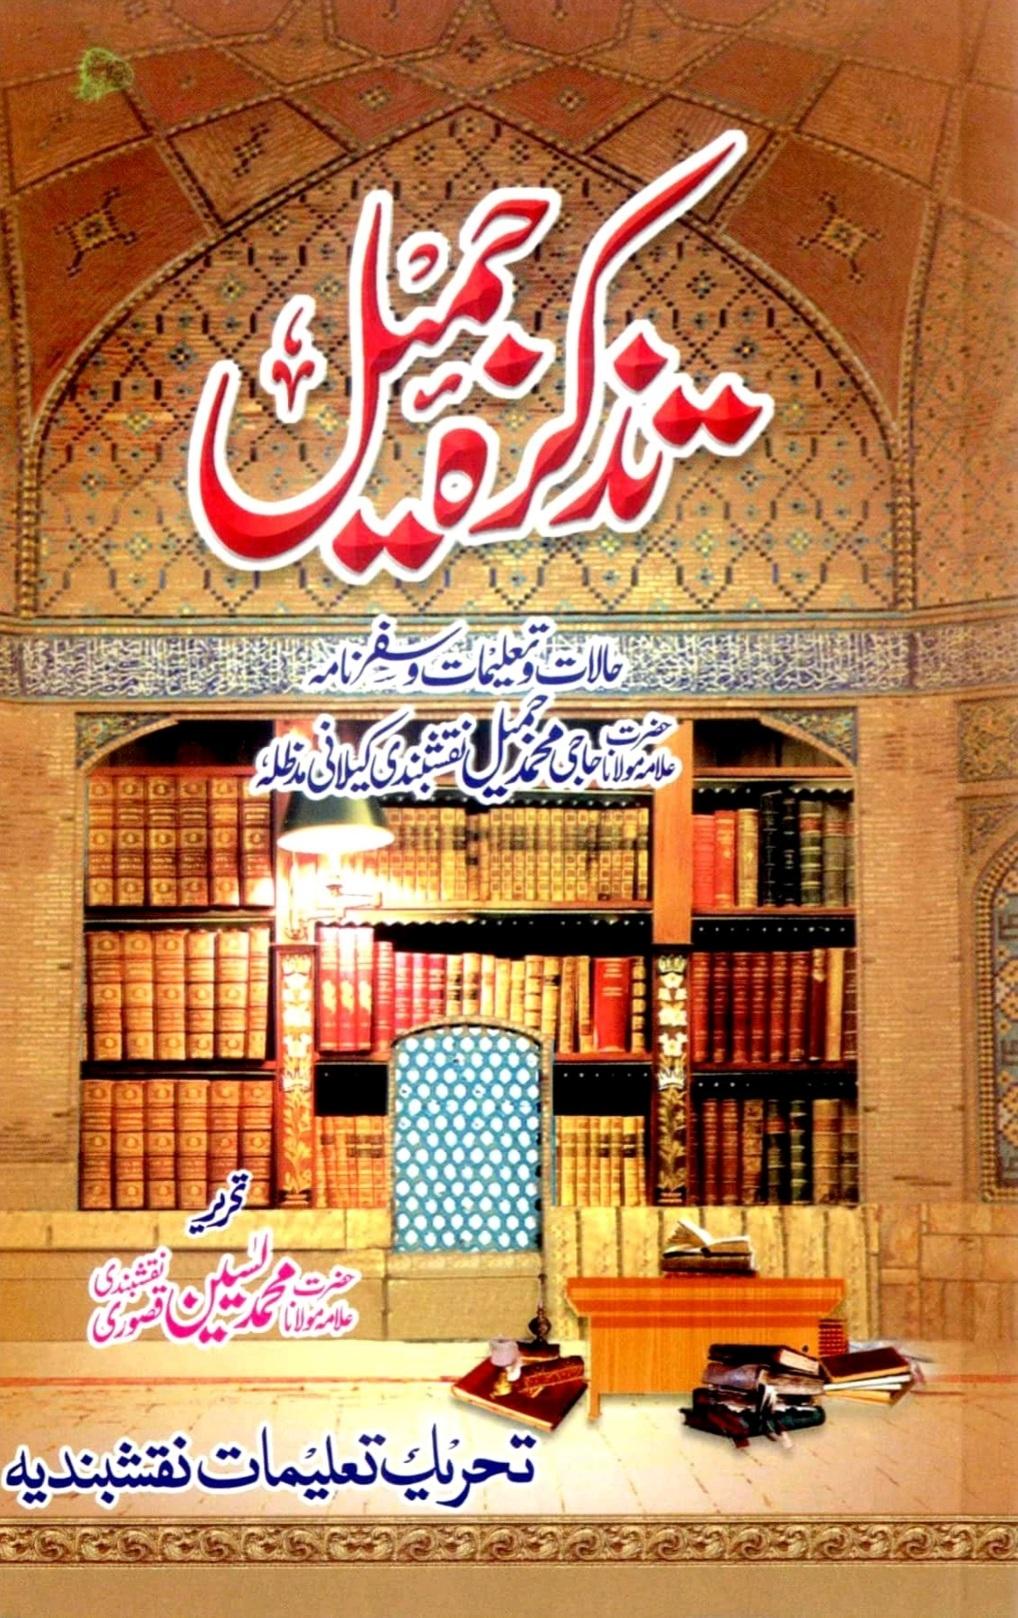 Tazkarah E Jameel / تذکرہ جمیلby مولانا محمد یسین قصوری نقشبندی